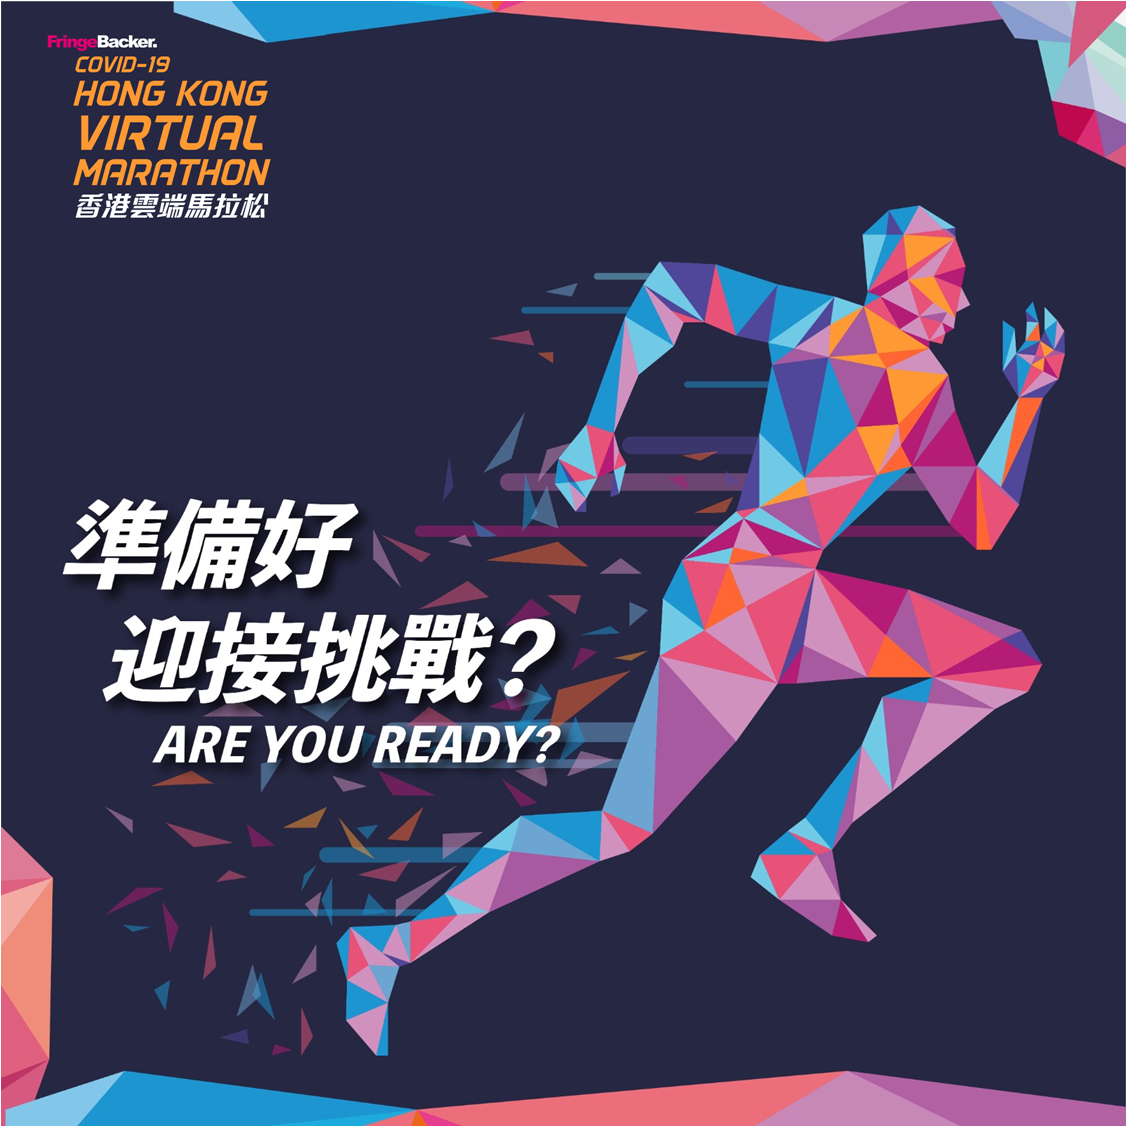 COVID-19 HK Virtual Marathon